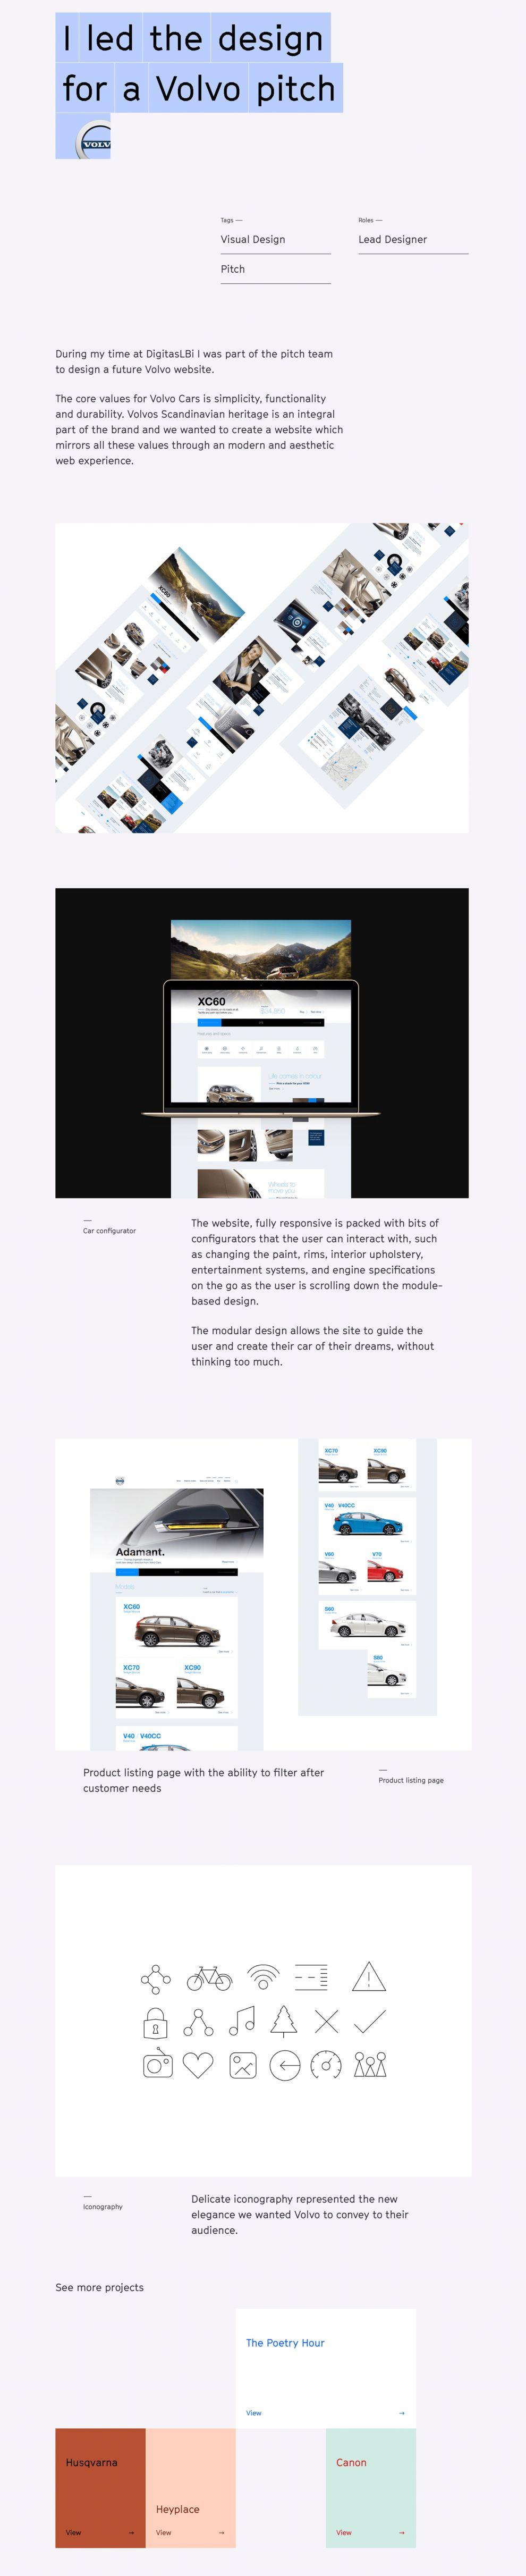 Sebastian Graz Minimal Product Page